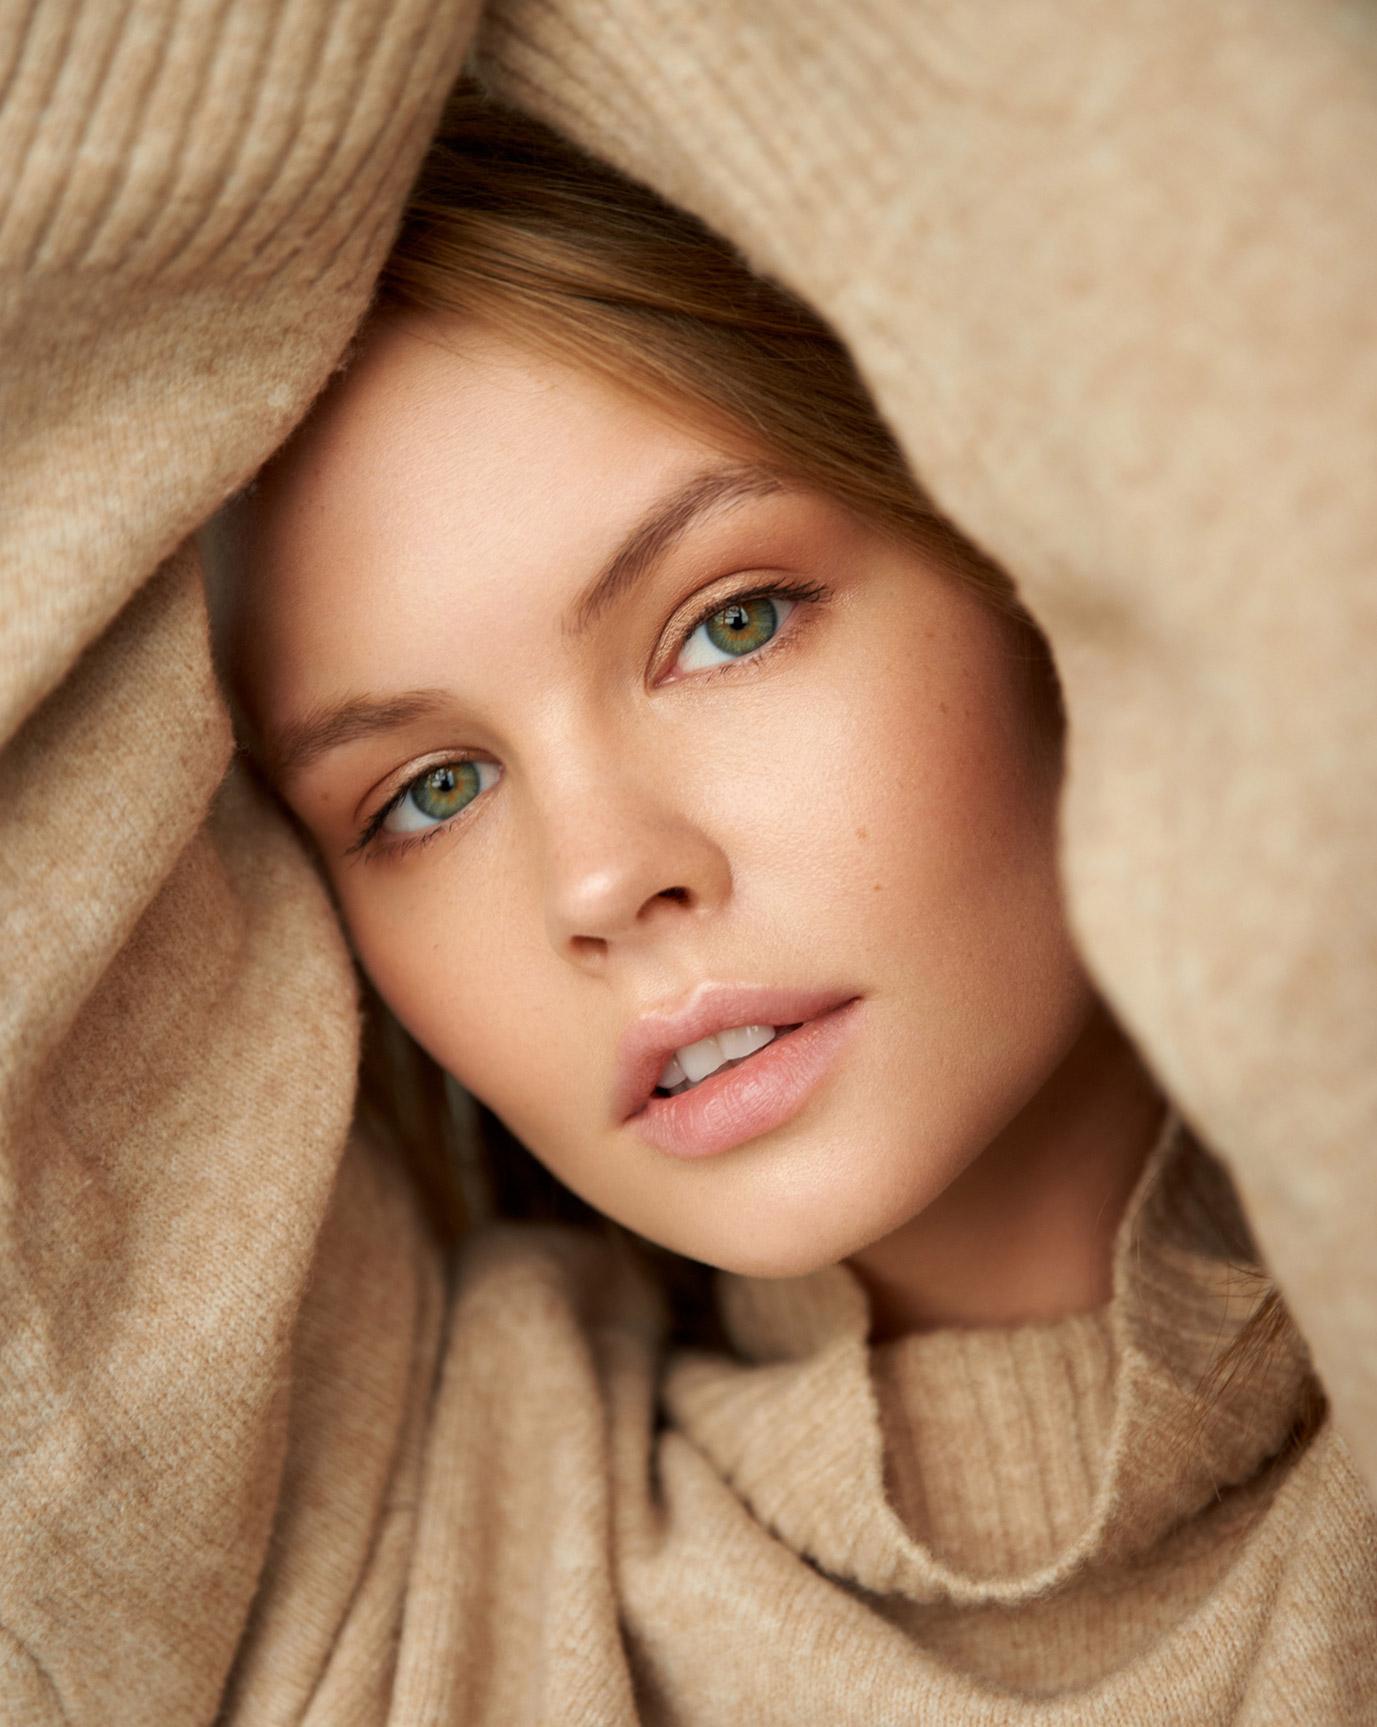 Анастасия Щеглова, фотограф Константин Крюковский / фото 02